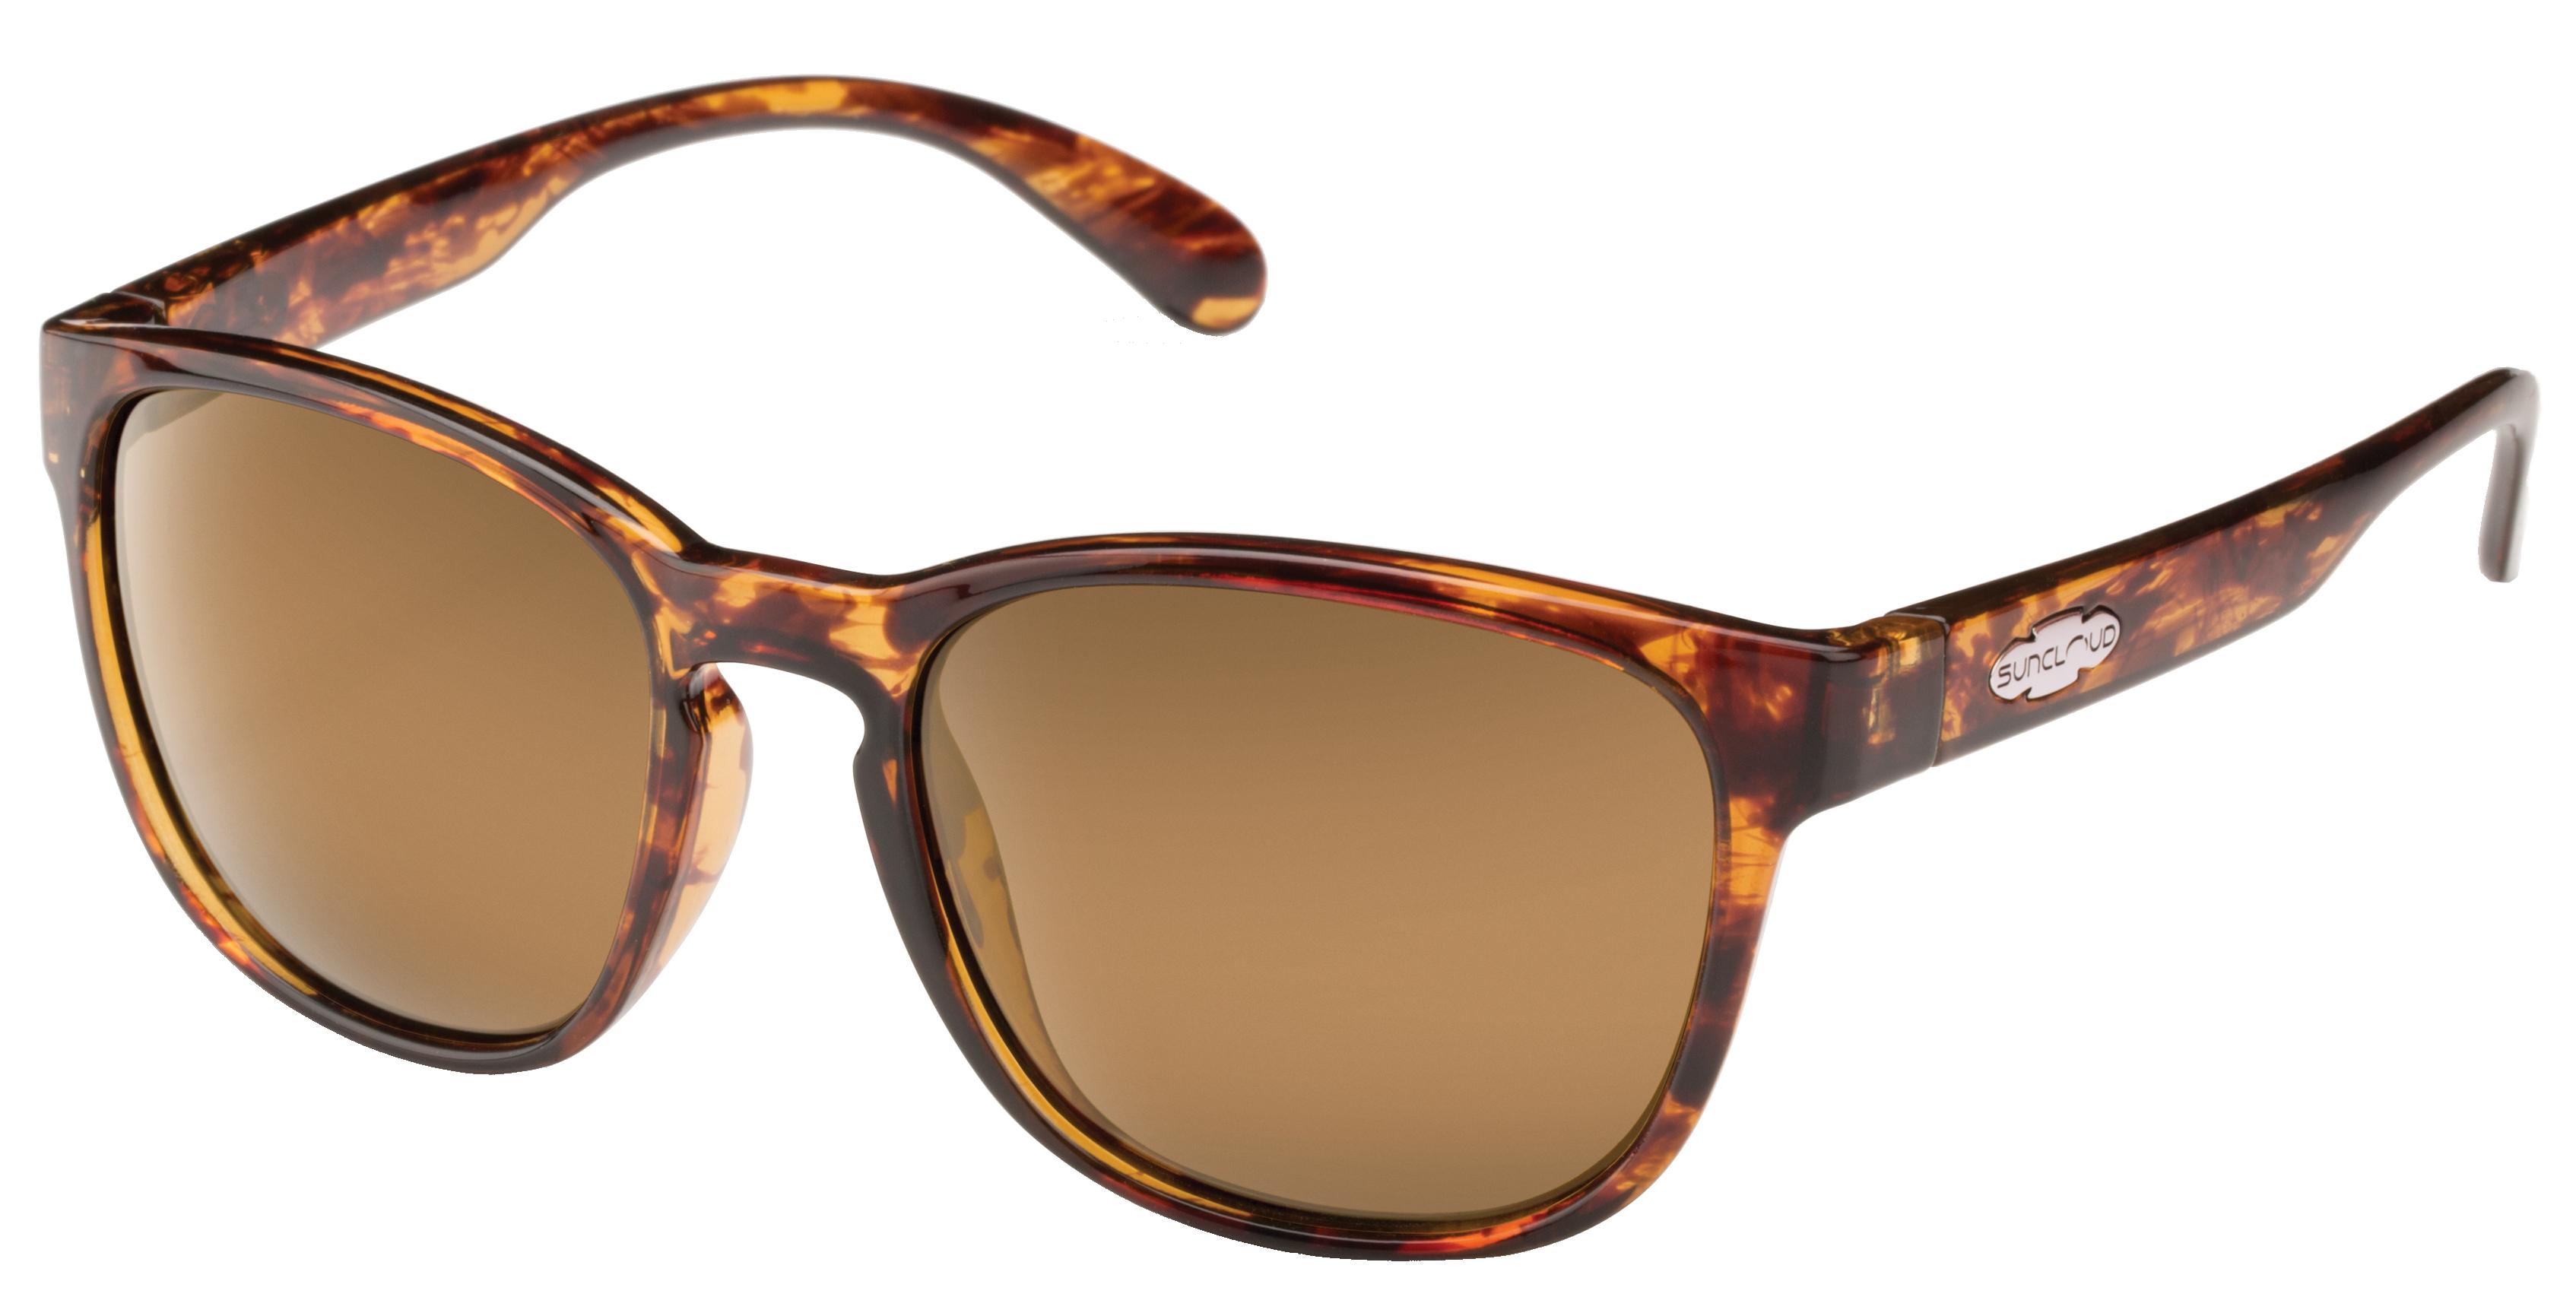 2e97b06e05 Suncloud Loveseat Polarized Sunglasses - Women s